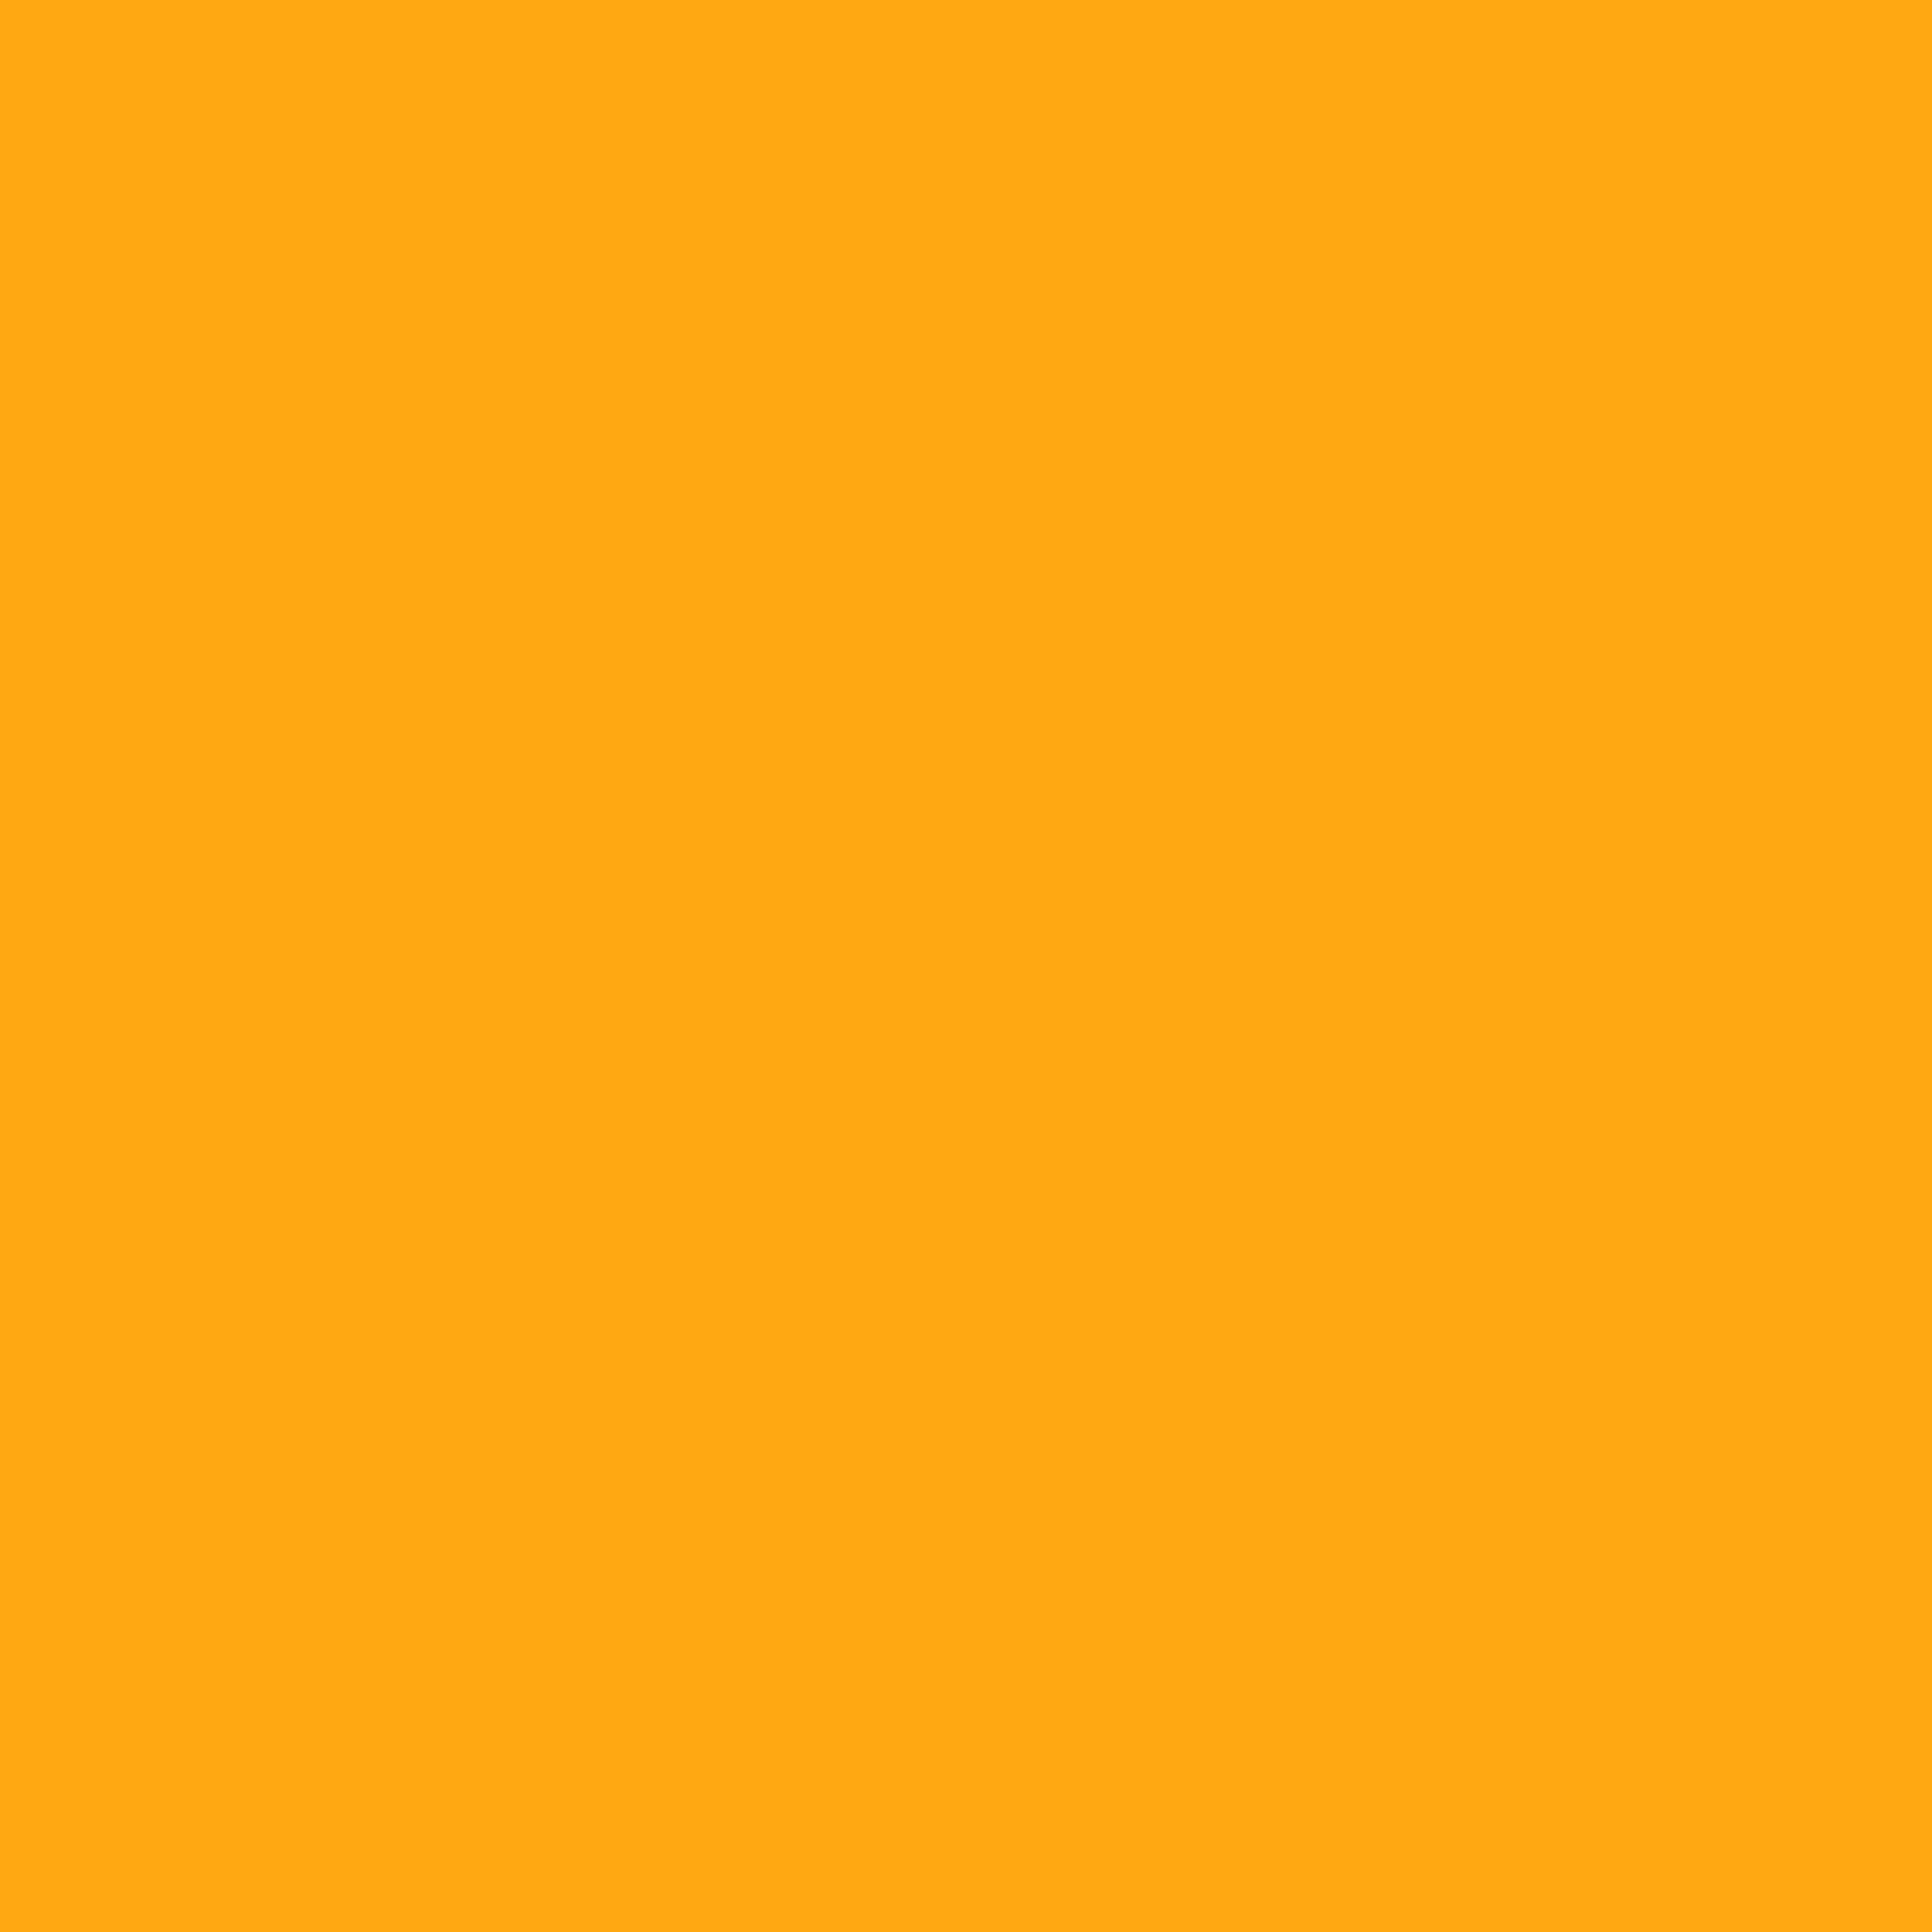 3600x3600 Dark Tangerine Solid Color Background